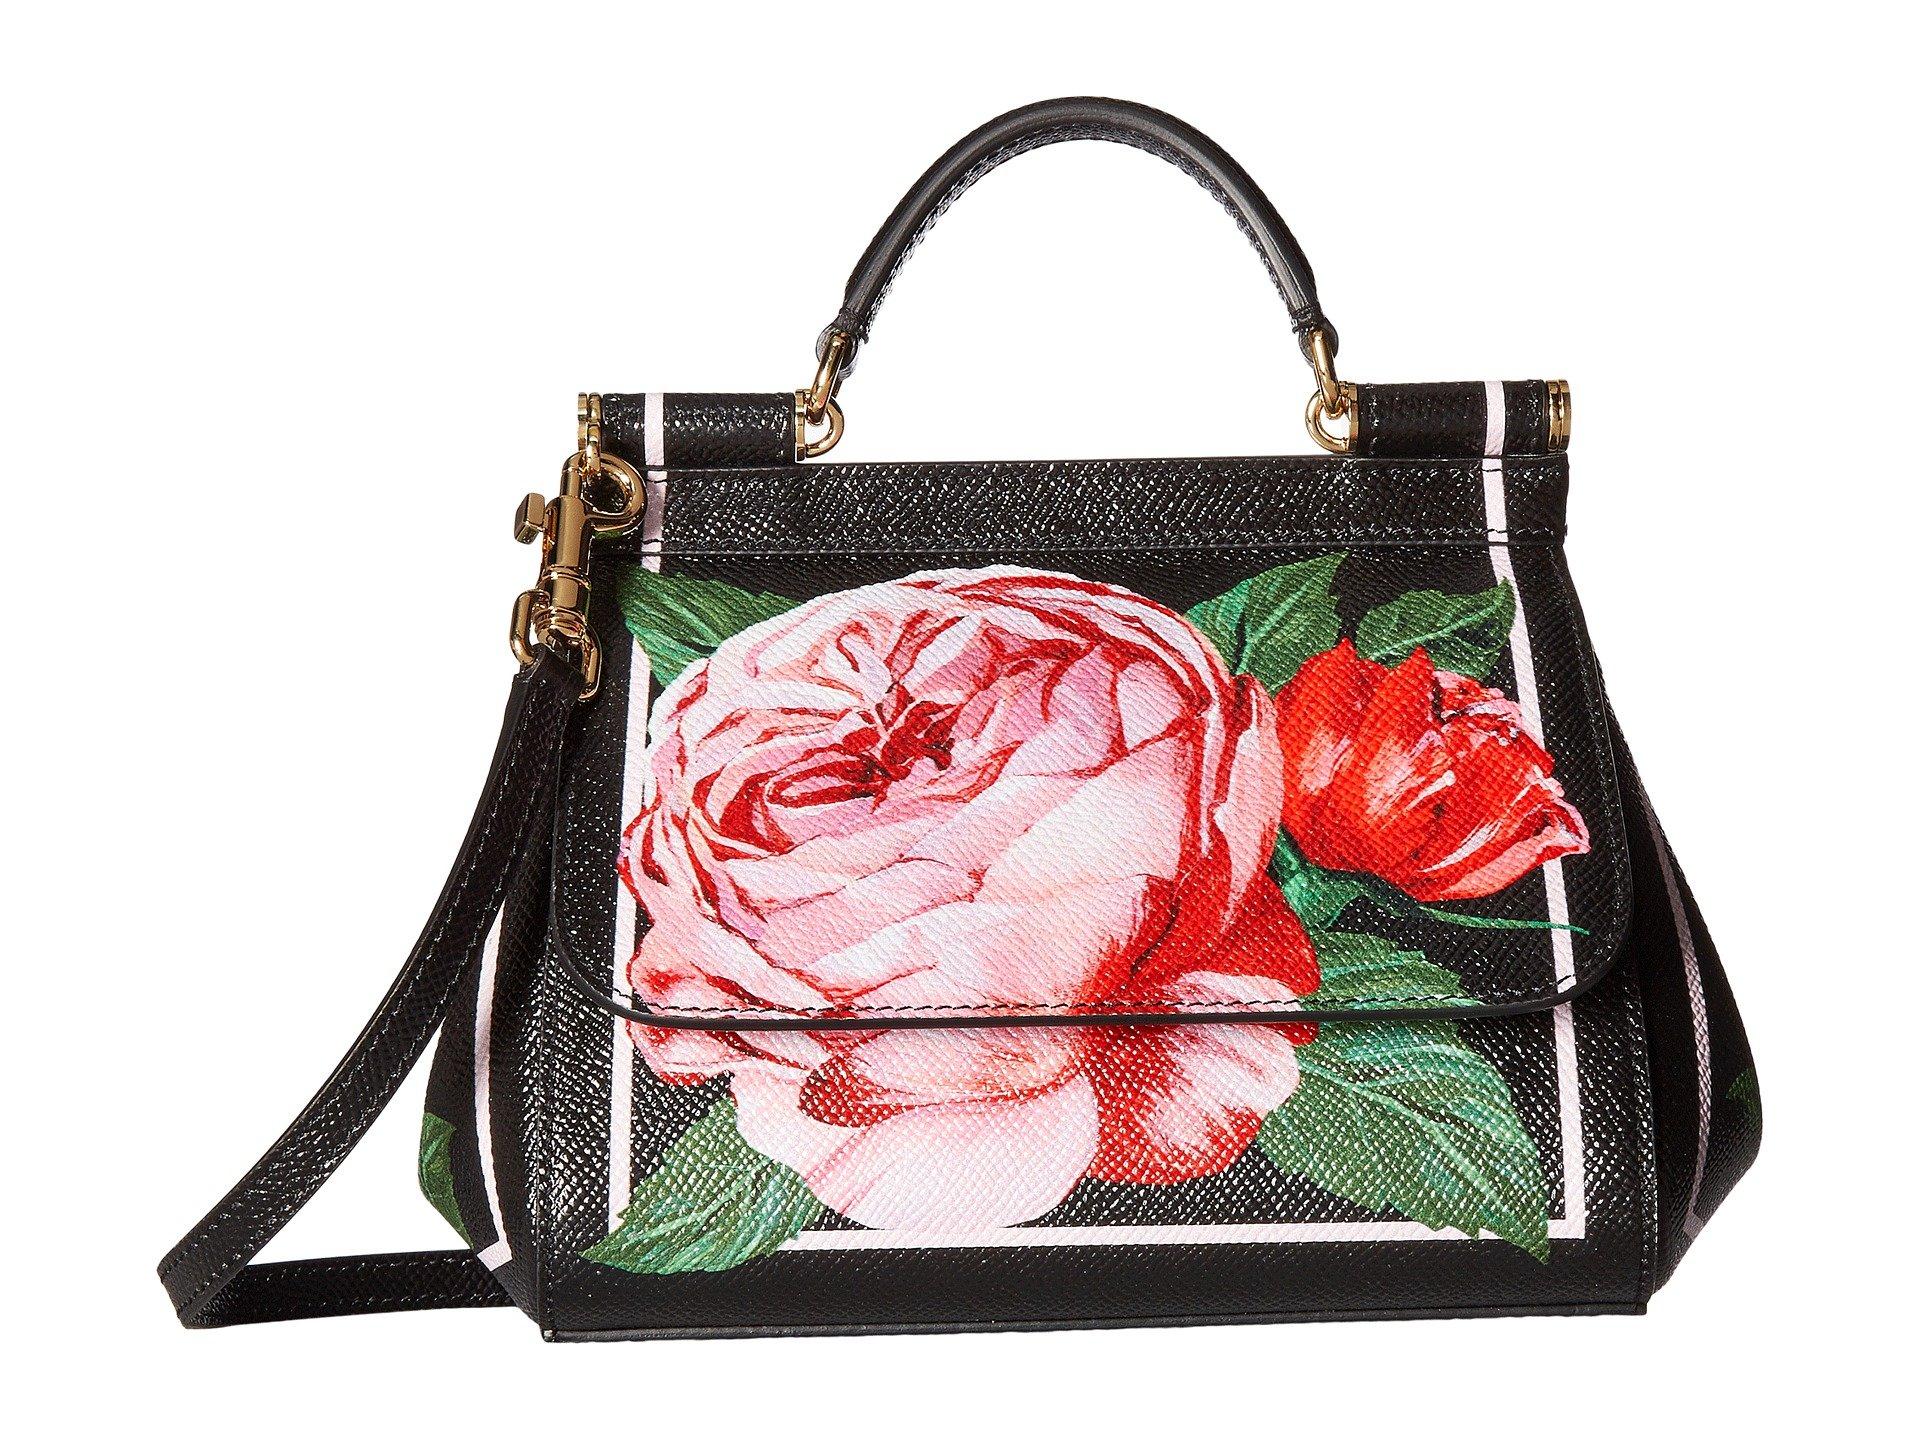 Bolso Cruzado para Mujer Dolce and Gabbana St. Dauphine Miss Sicily Mini Bag  + Dolce & Gabbana en VeoyCompro.net